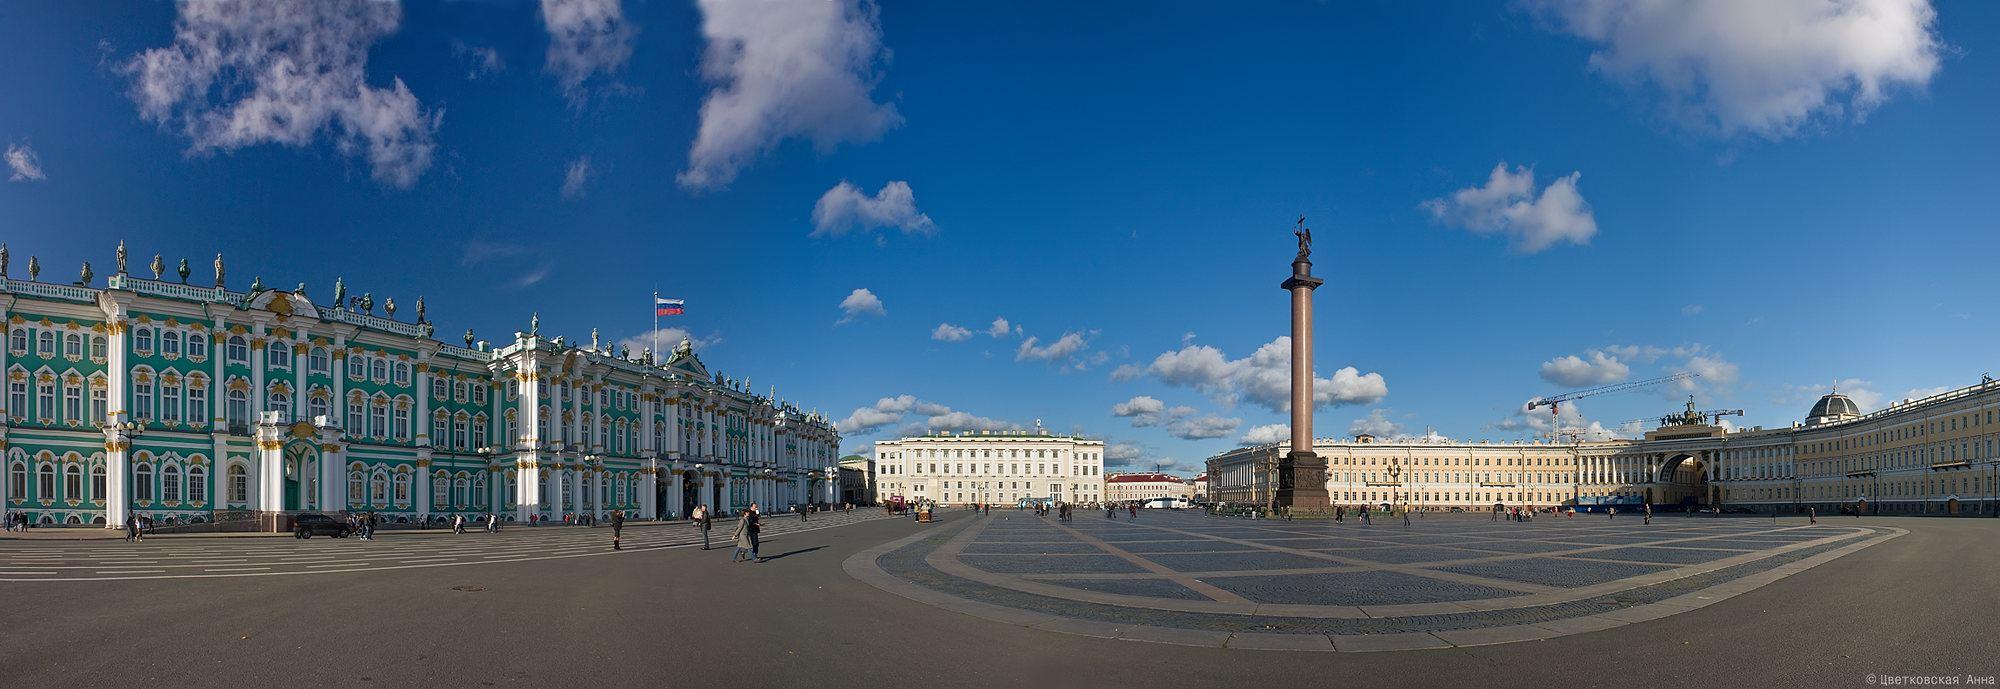 "фото ""Дворцовая площадь"" метки: панорама, Санкт-Петербург, здание"